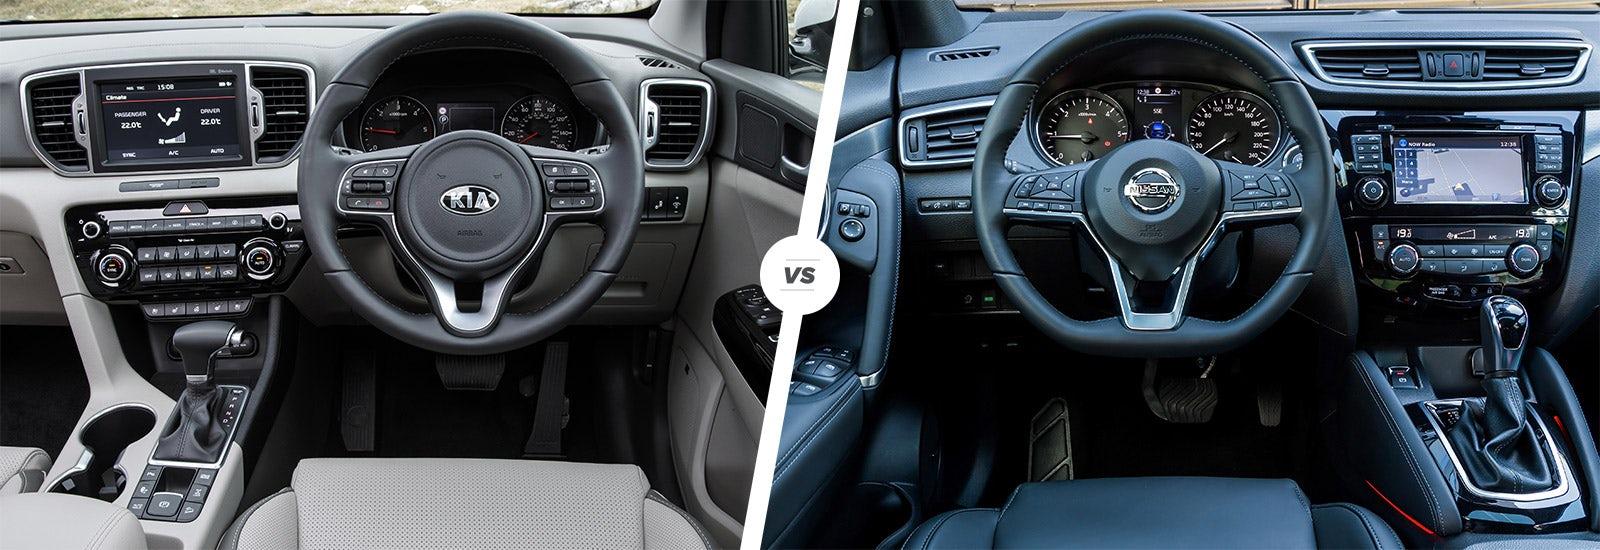 Kia Sportage vs Nissan Qashqai: which is best? | carwow